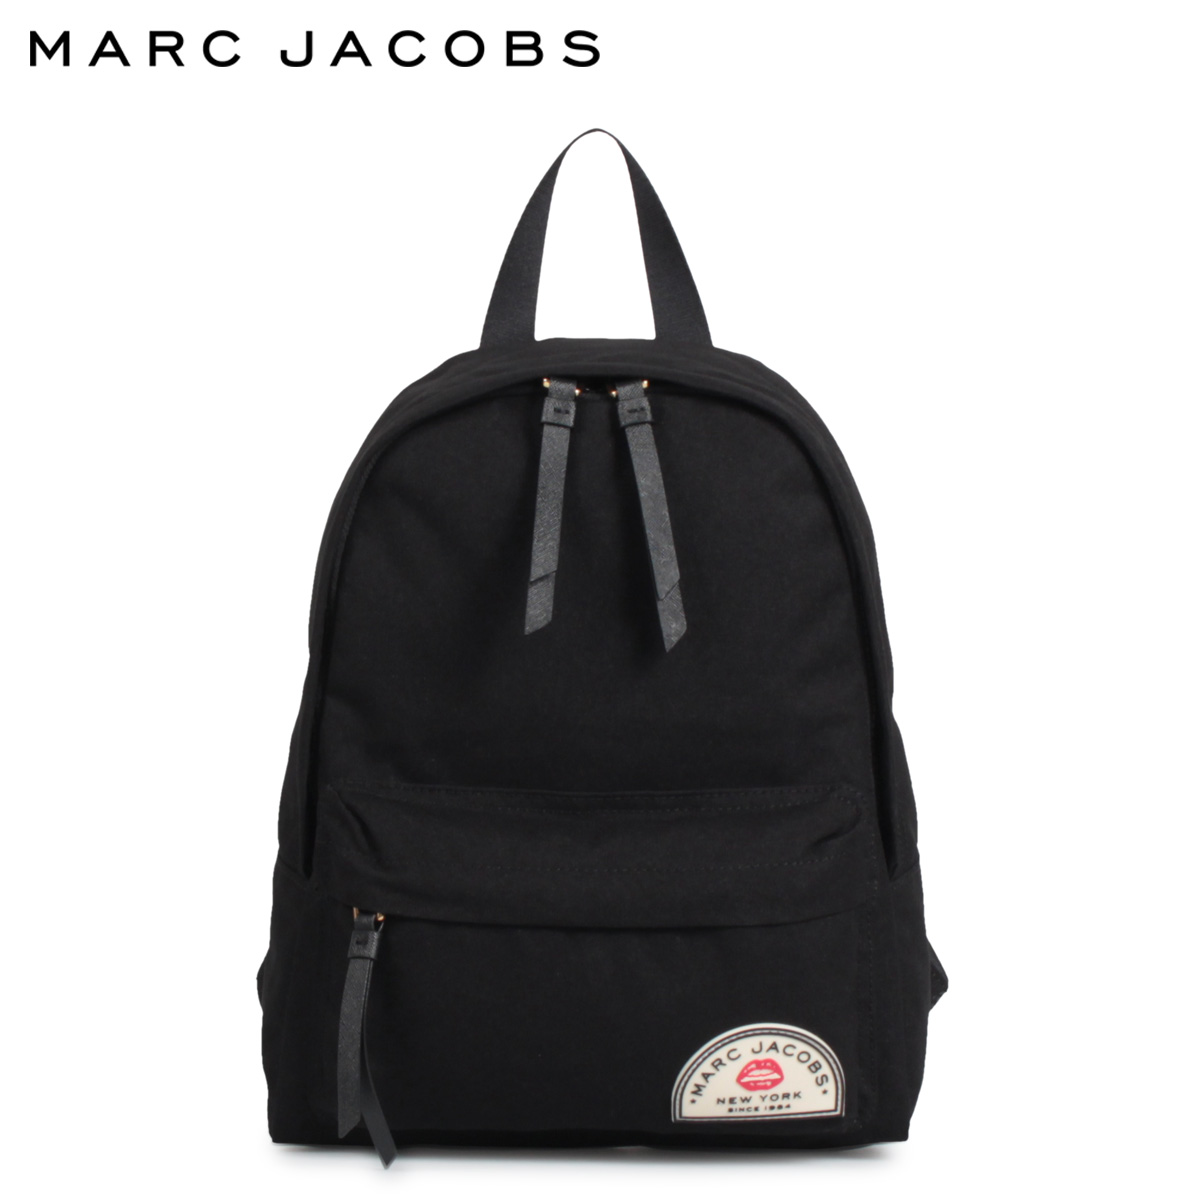 MARC JACOBS マークジェイコブス リュック バッグ バックパック メンズ レディース COLLEGIATE MEDIUM BACKPACK ブラック 黒 M0015404